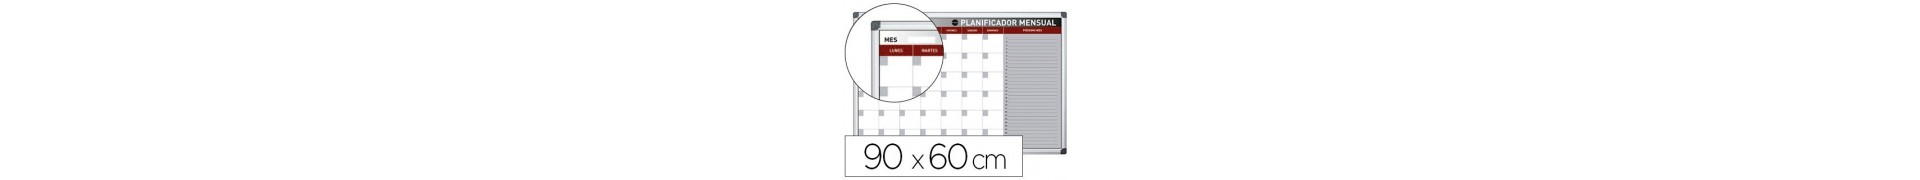 Planning/paneles señalización